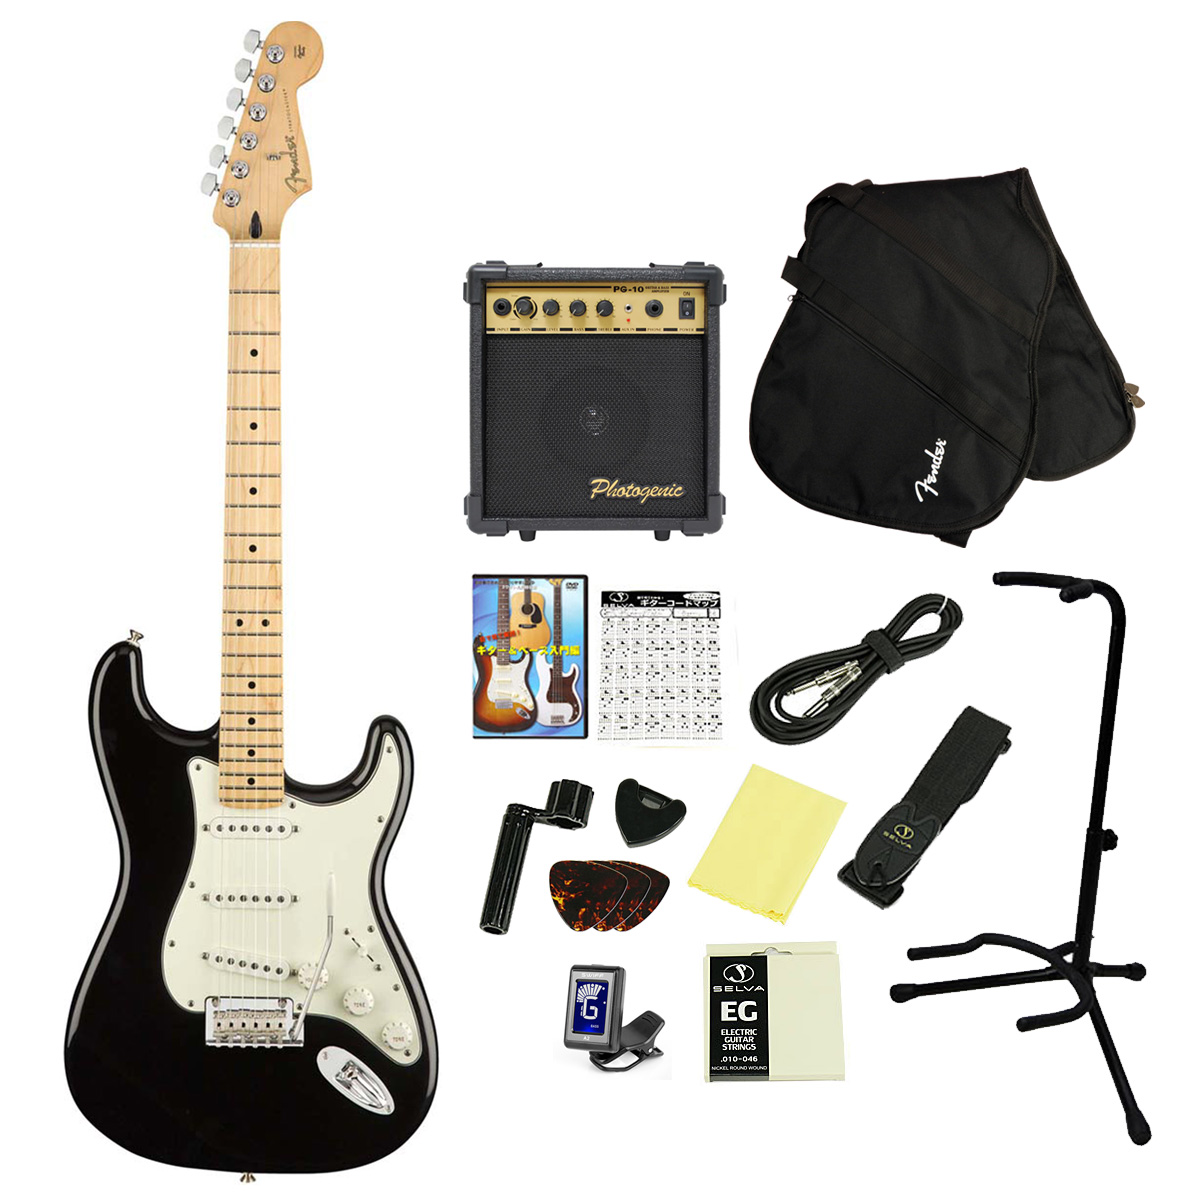 Fender / Player Series Stratocaster Black Maple 16点アクセサリーセット